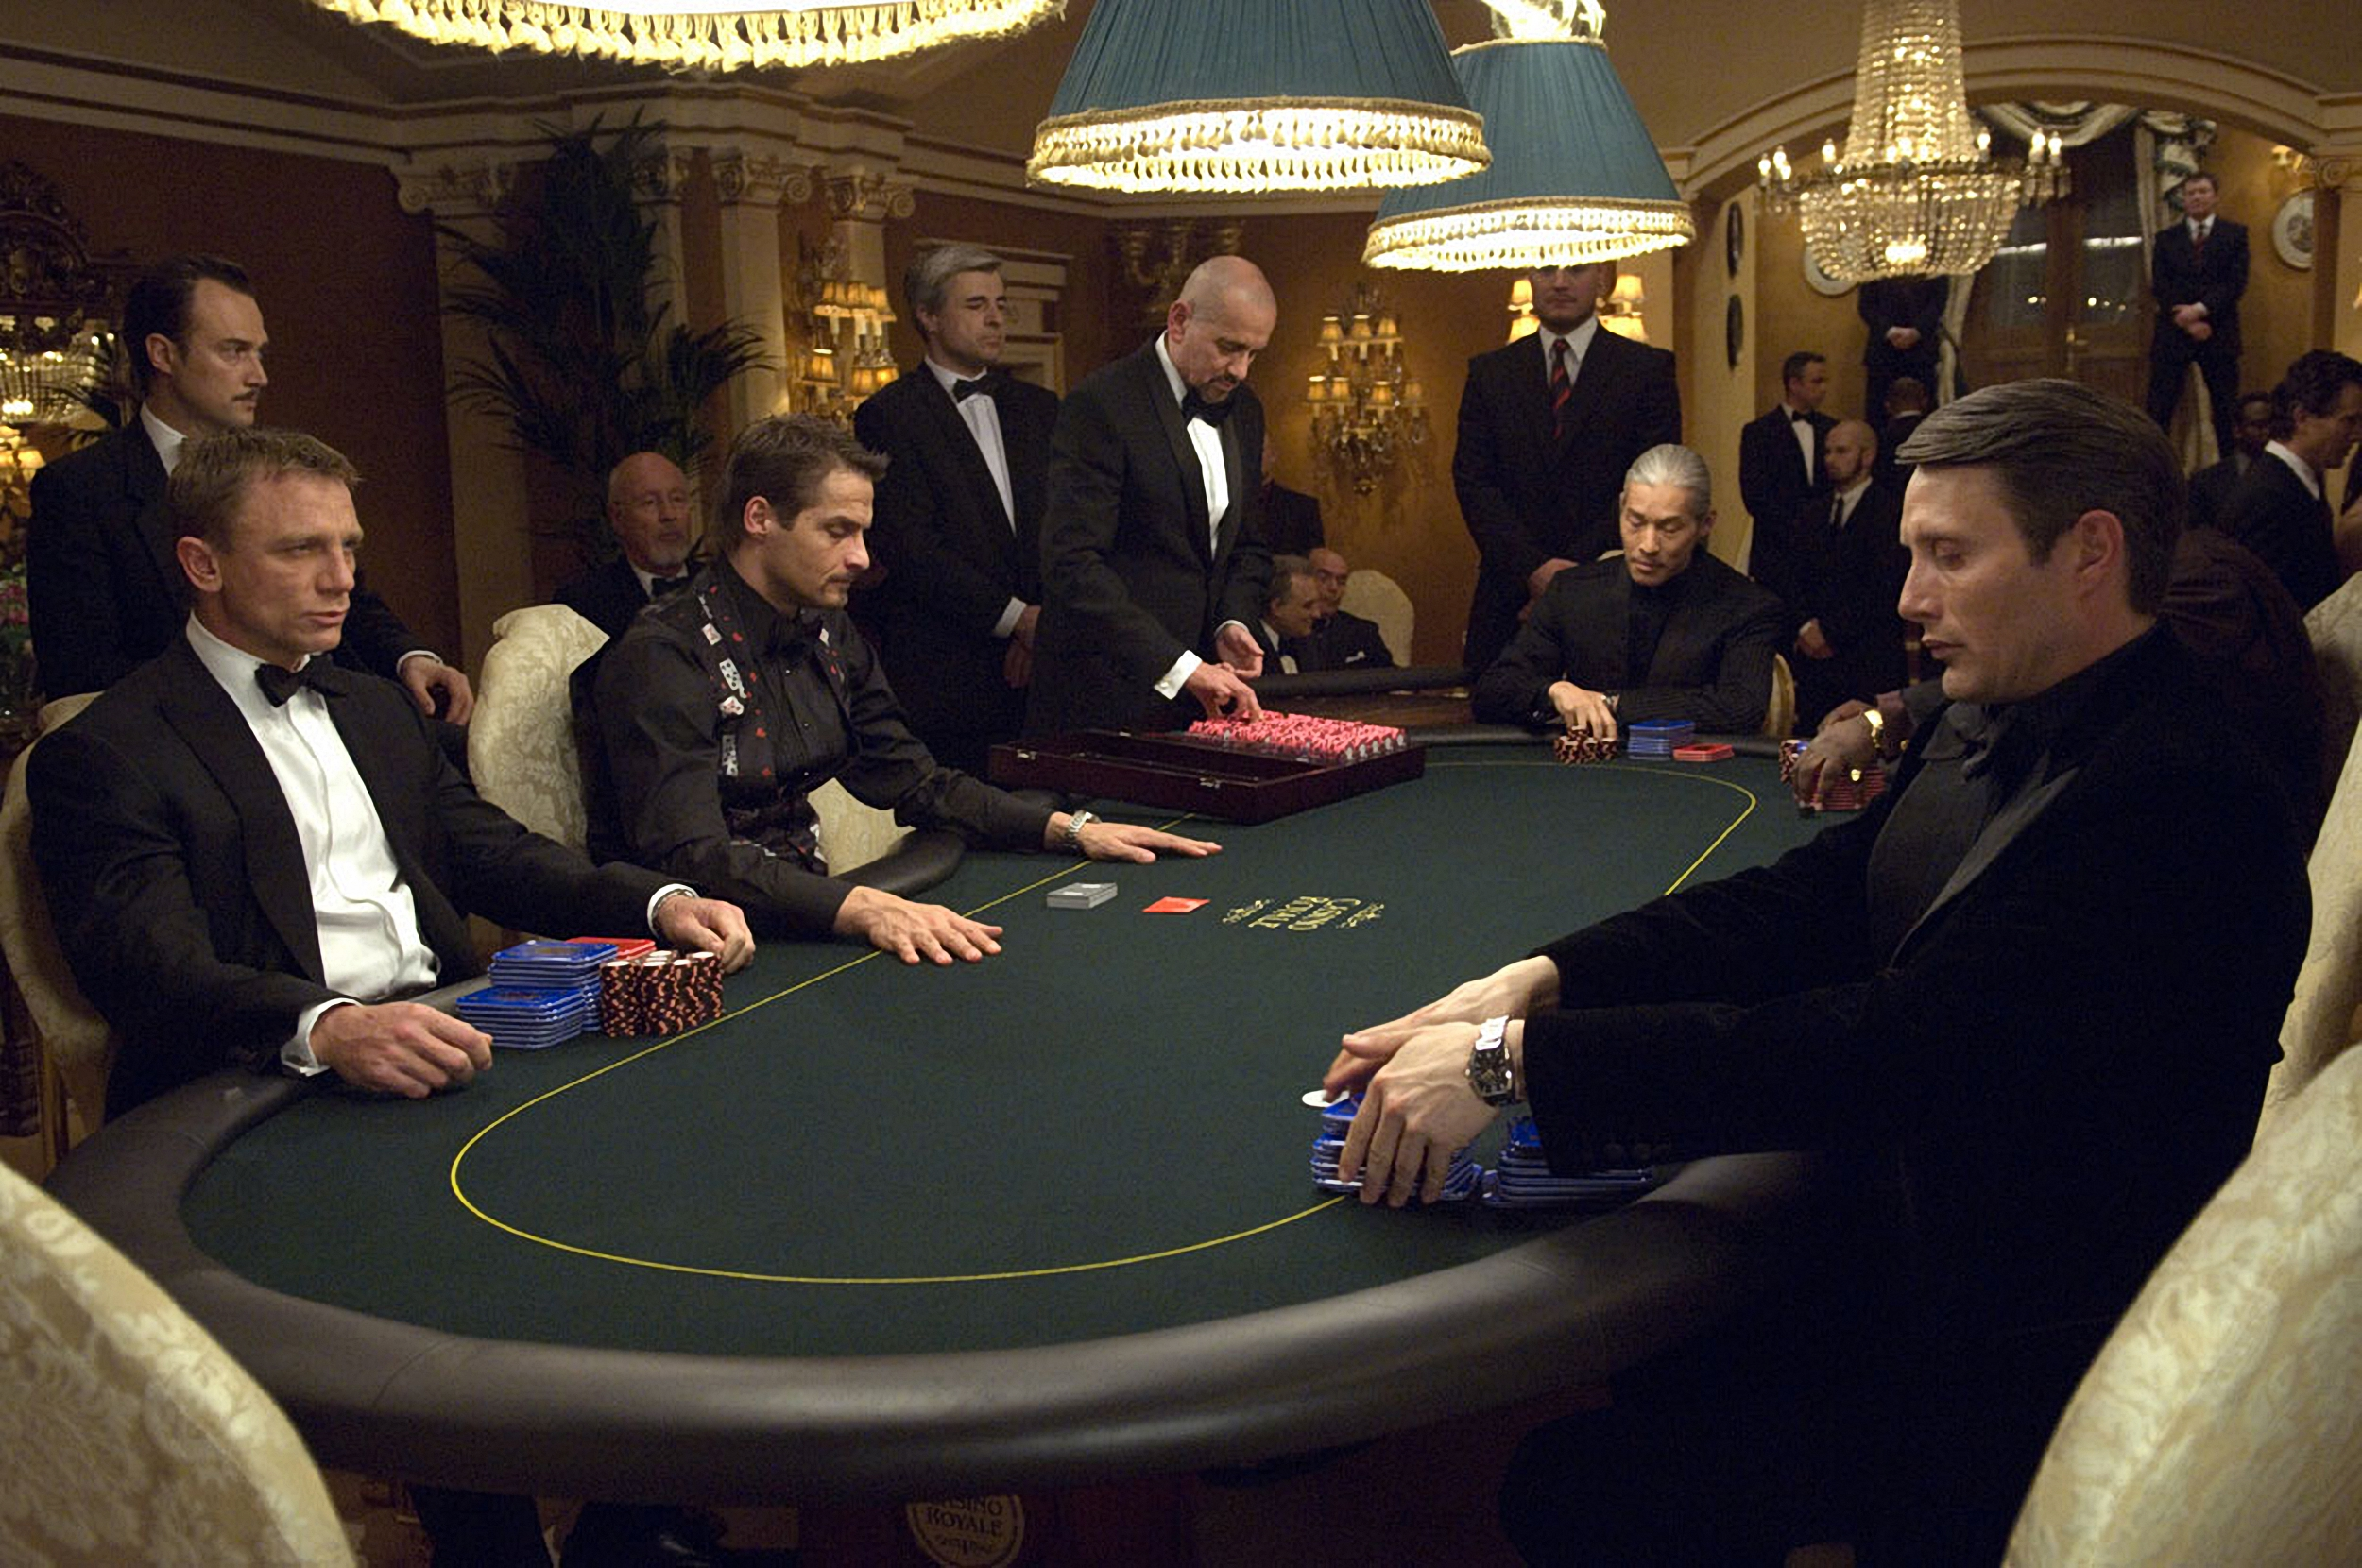 Royale casino game port gamble sklallam tribe jobs